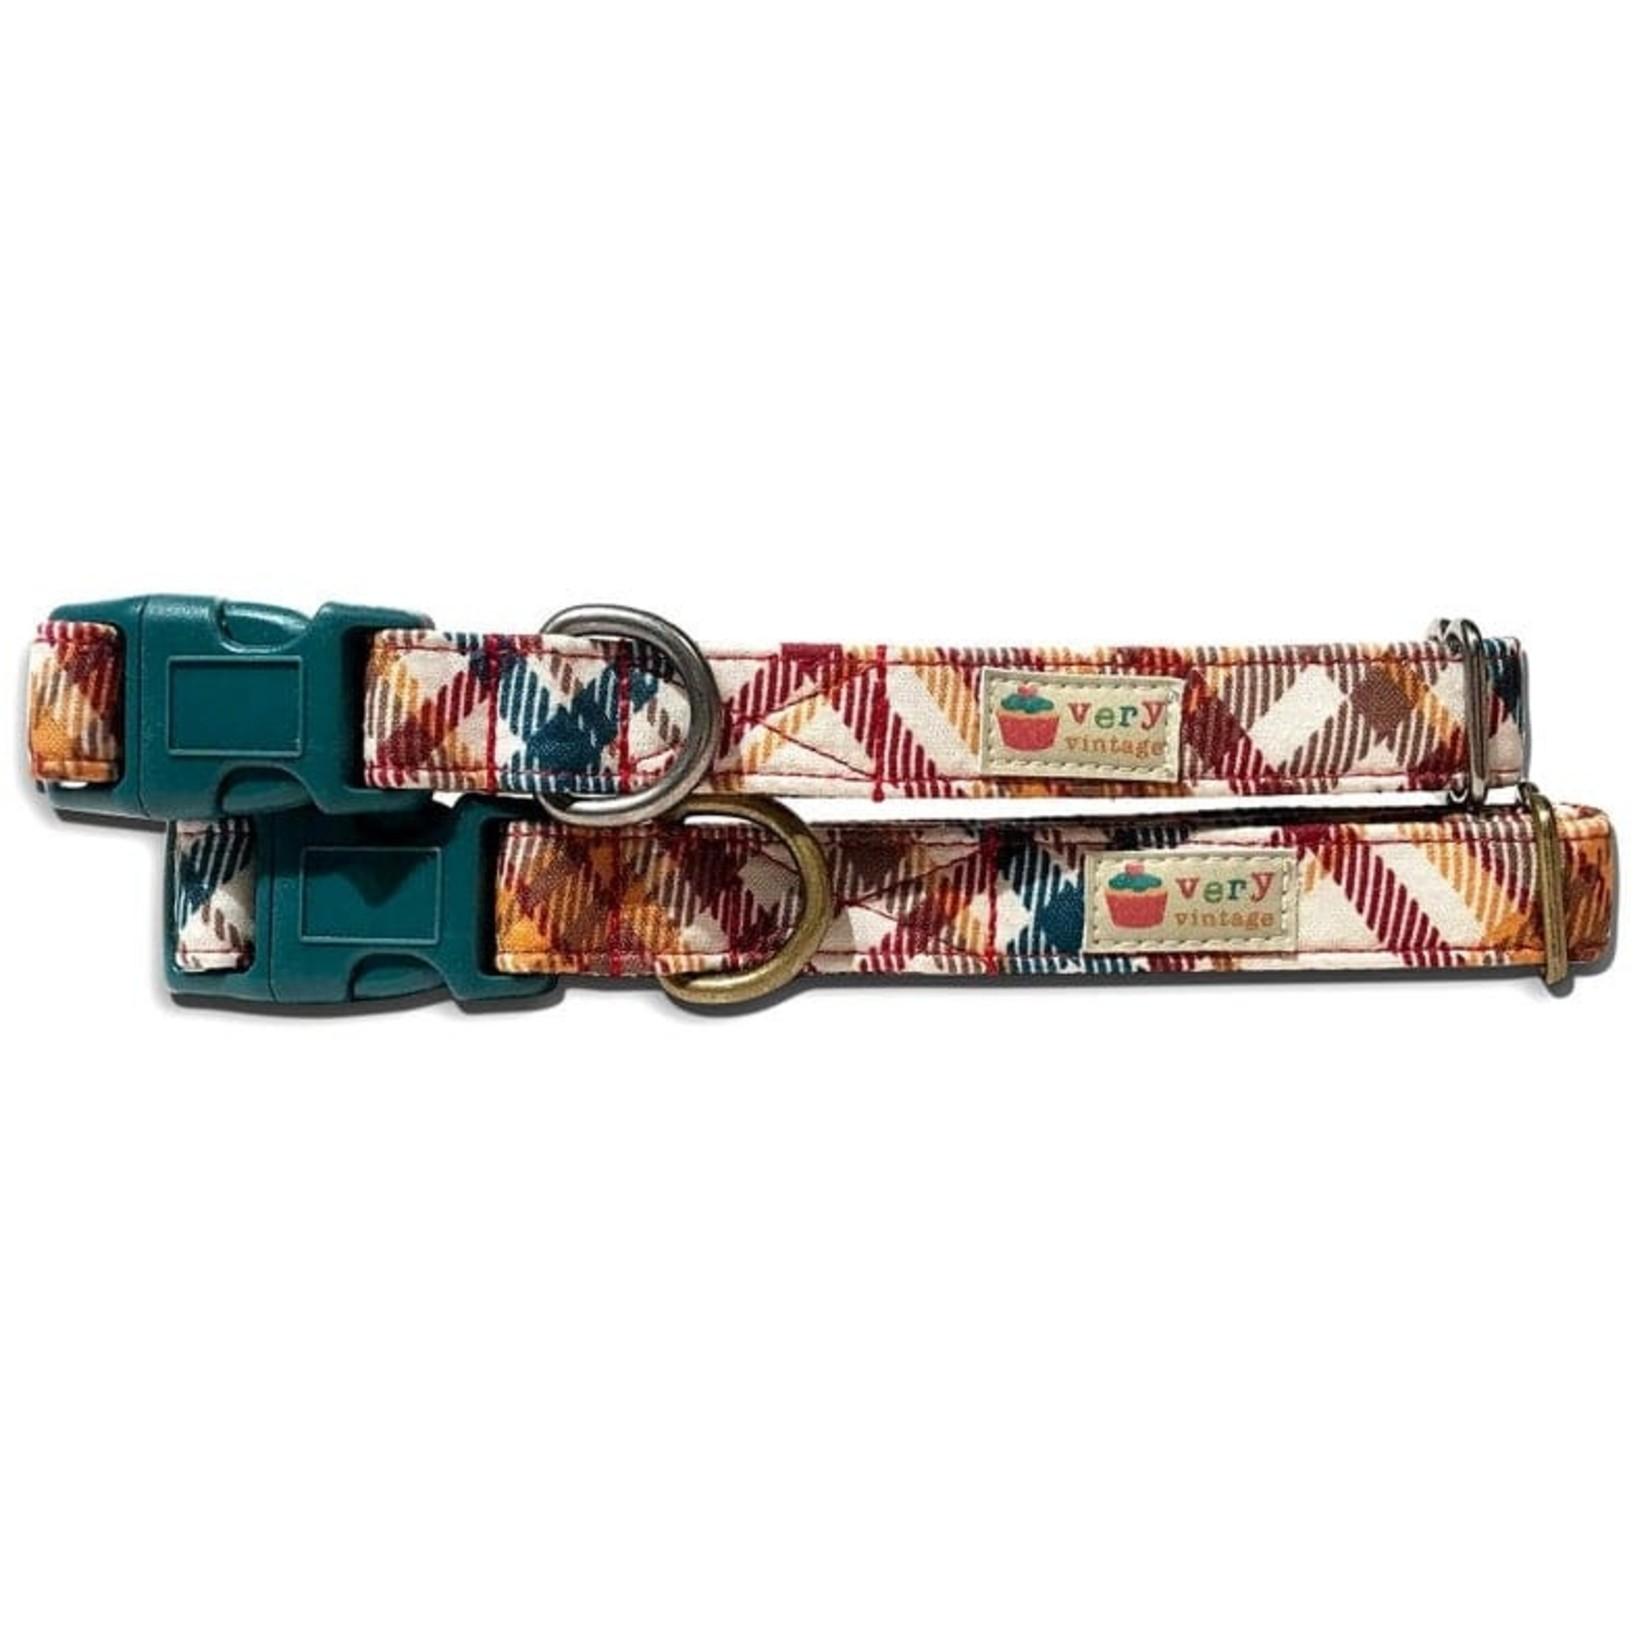 Very Vintage VERY VINTAGE Acorn Spice Dog Collar